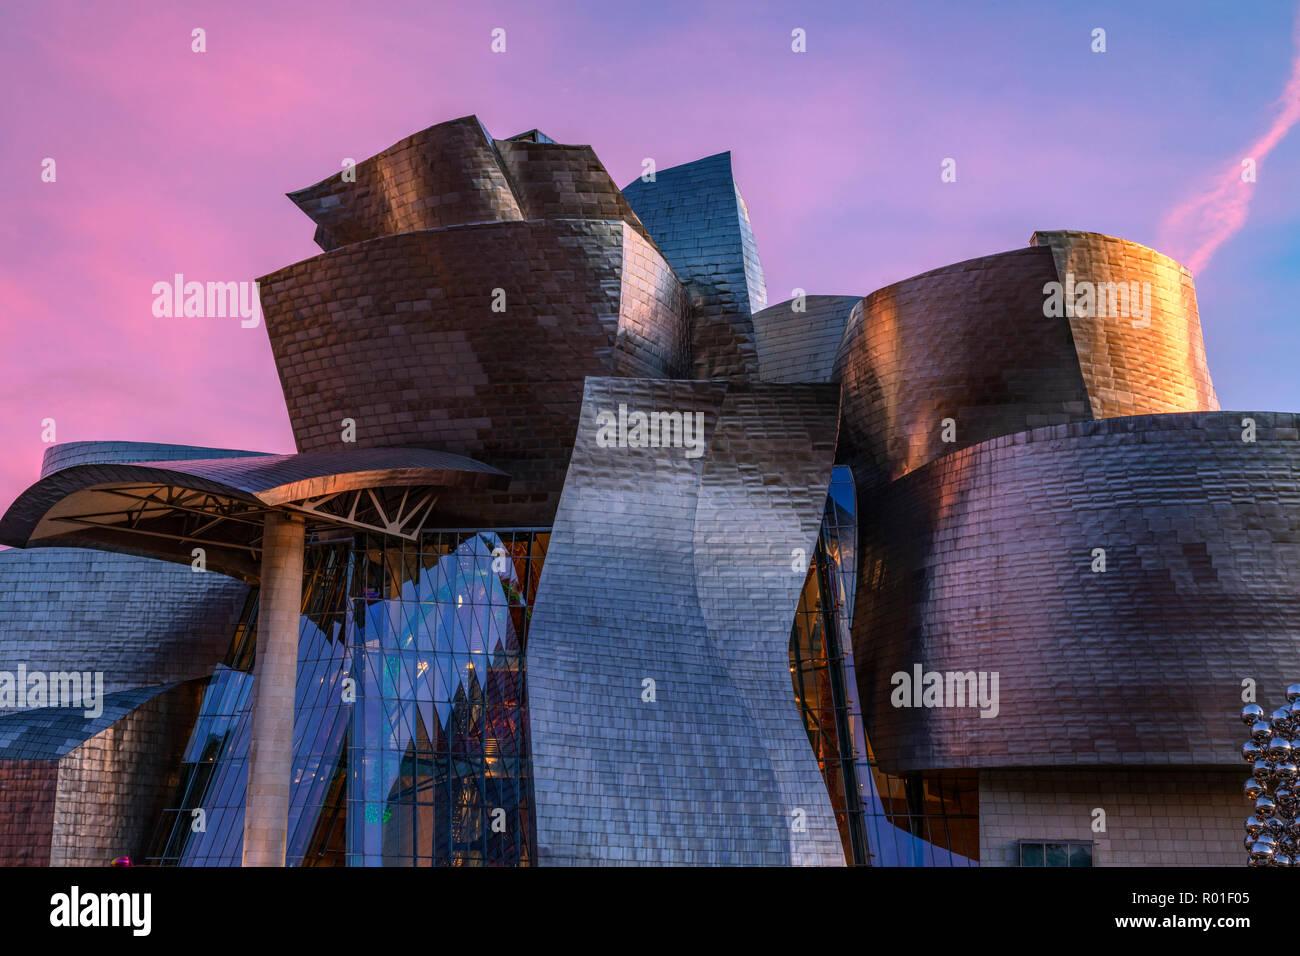 Museo Guggenheim, Bilbao, País Vasco, España, Europa Foto de stock